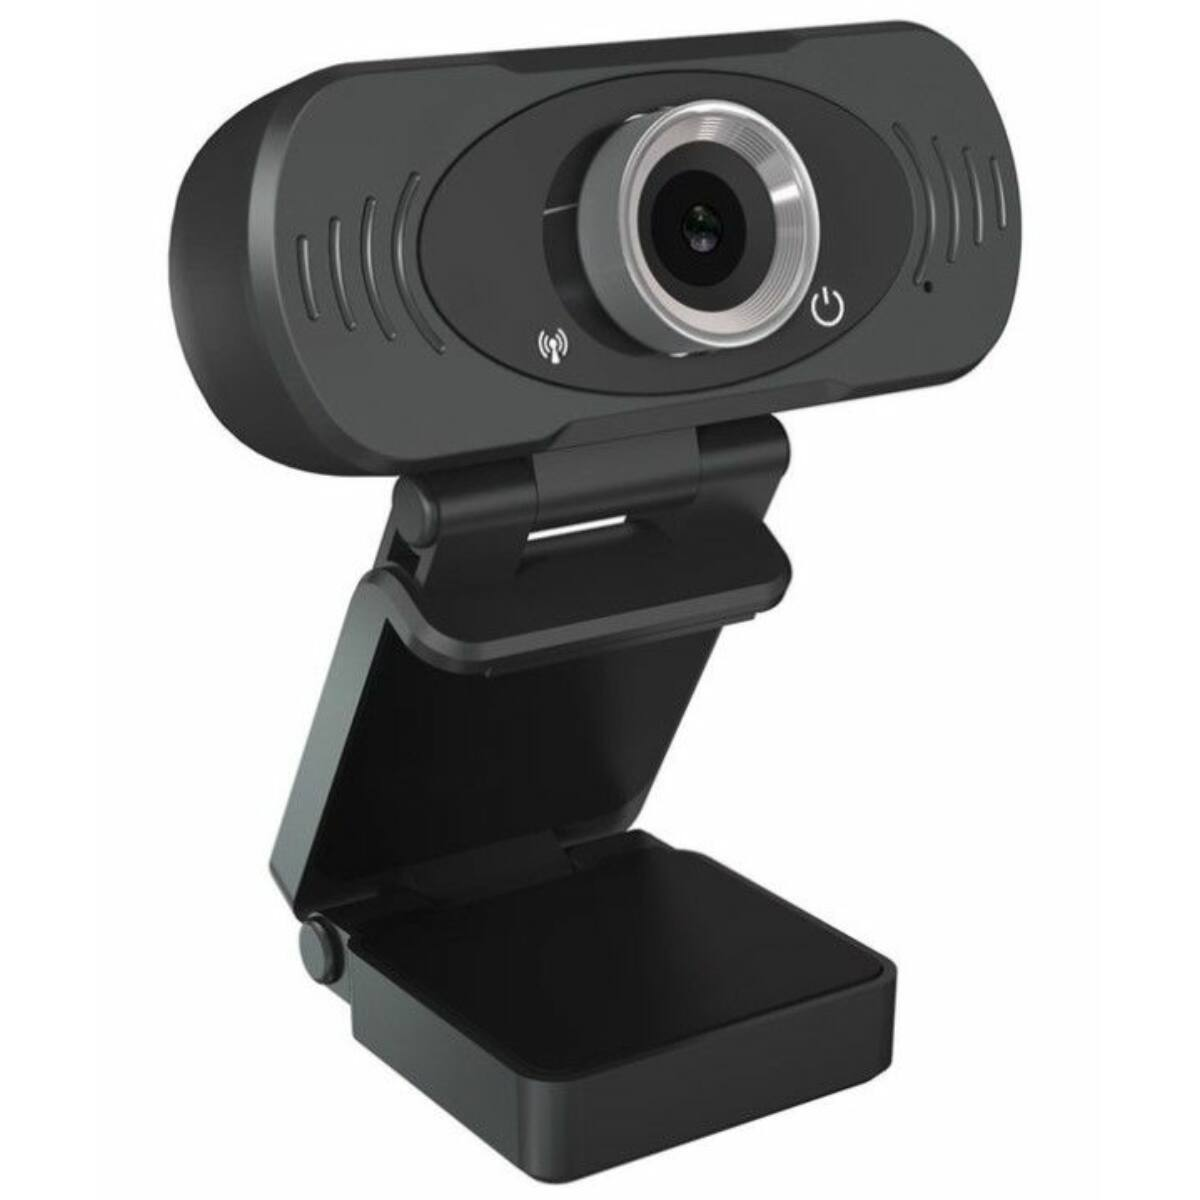 Xiaomi IMILAB W88S Webcamera 1080p Full HD, fekete EU